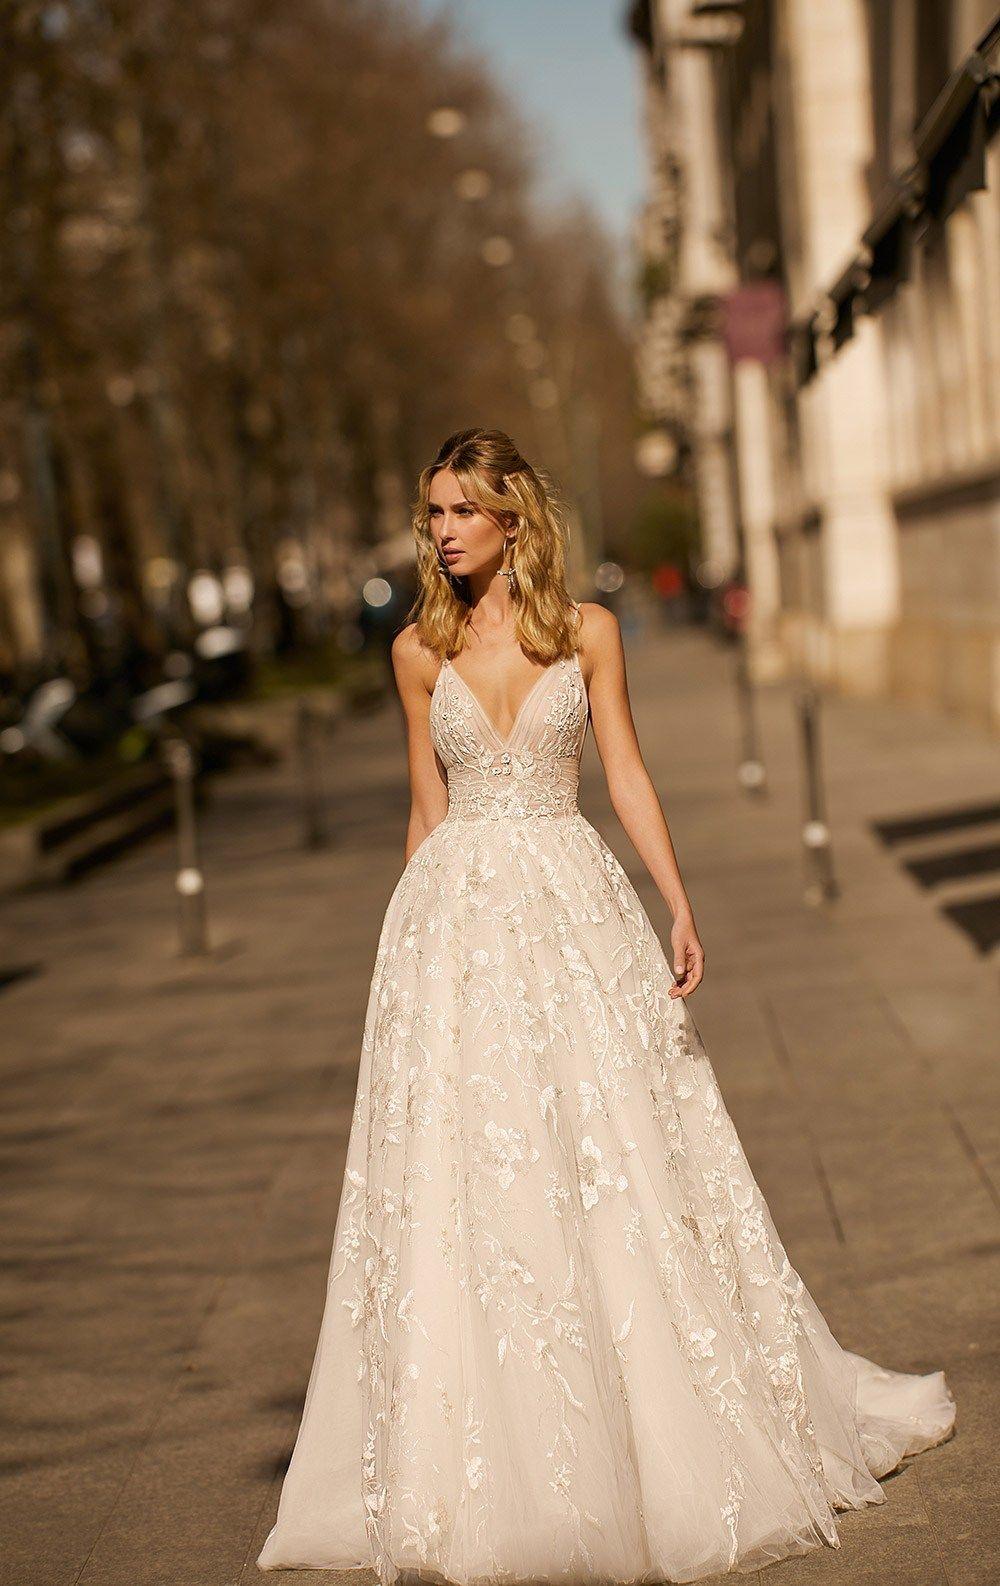 BERTA Bridal Spring 2020 Collection - The Wedding Notebook magazine